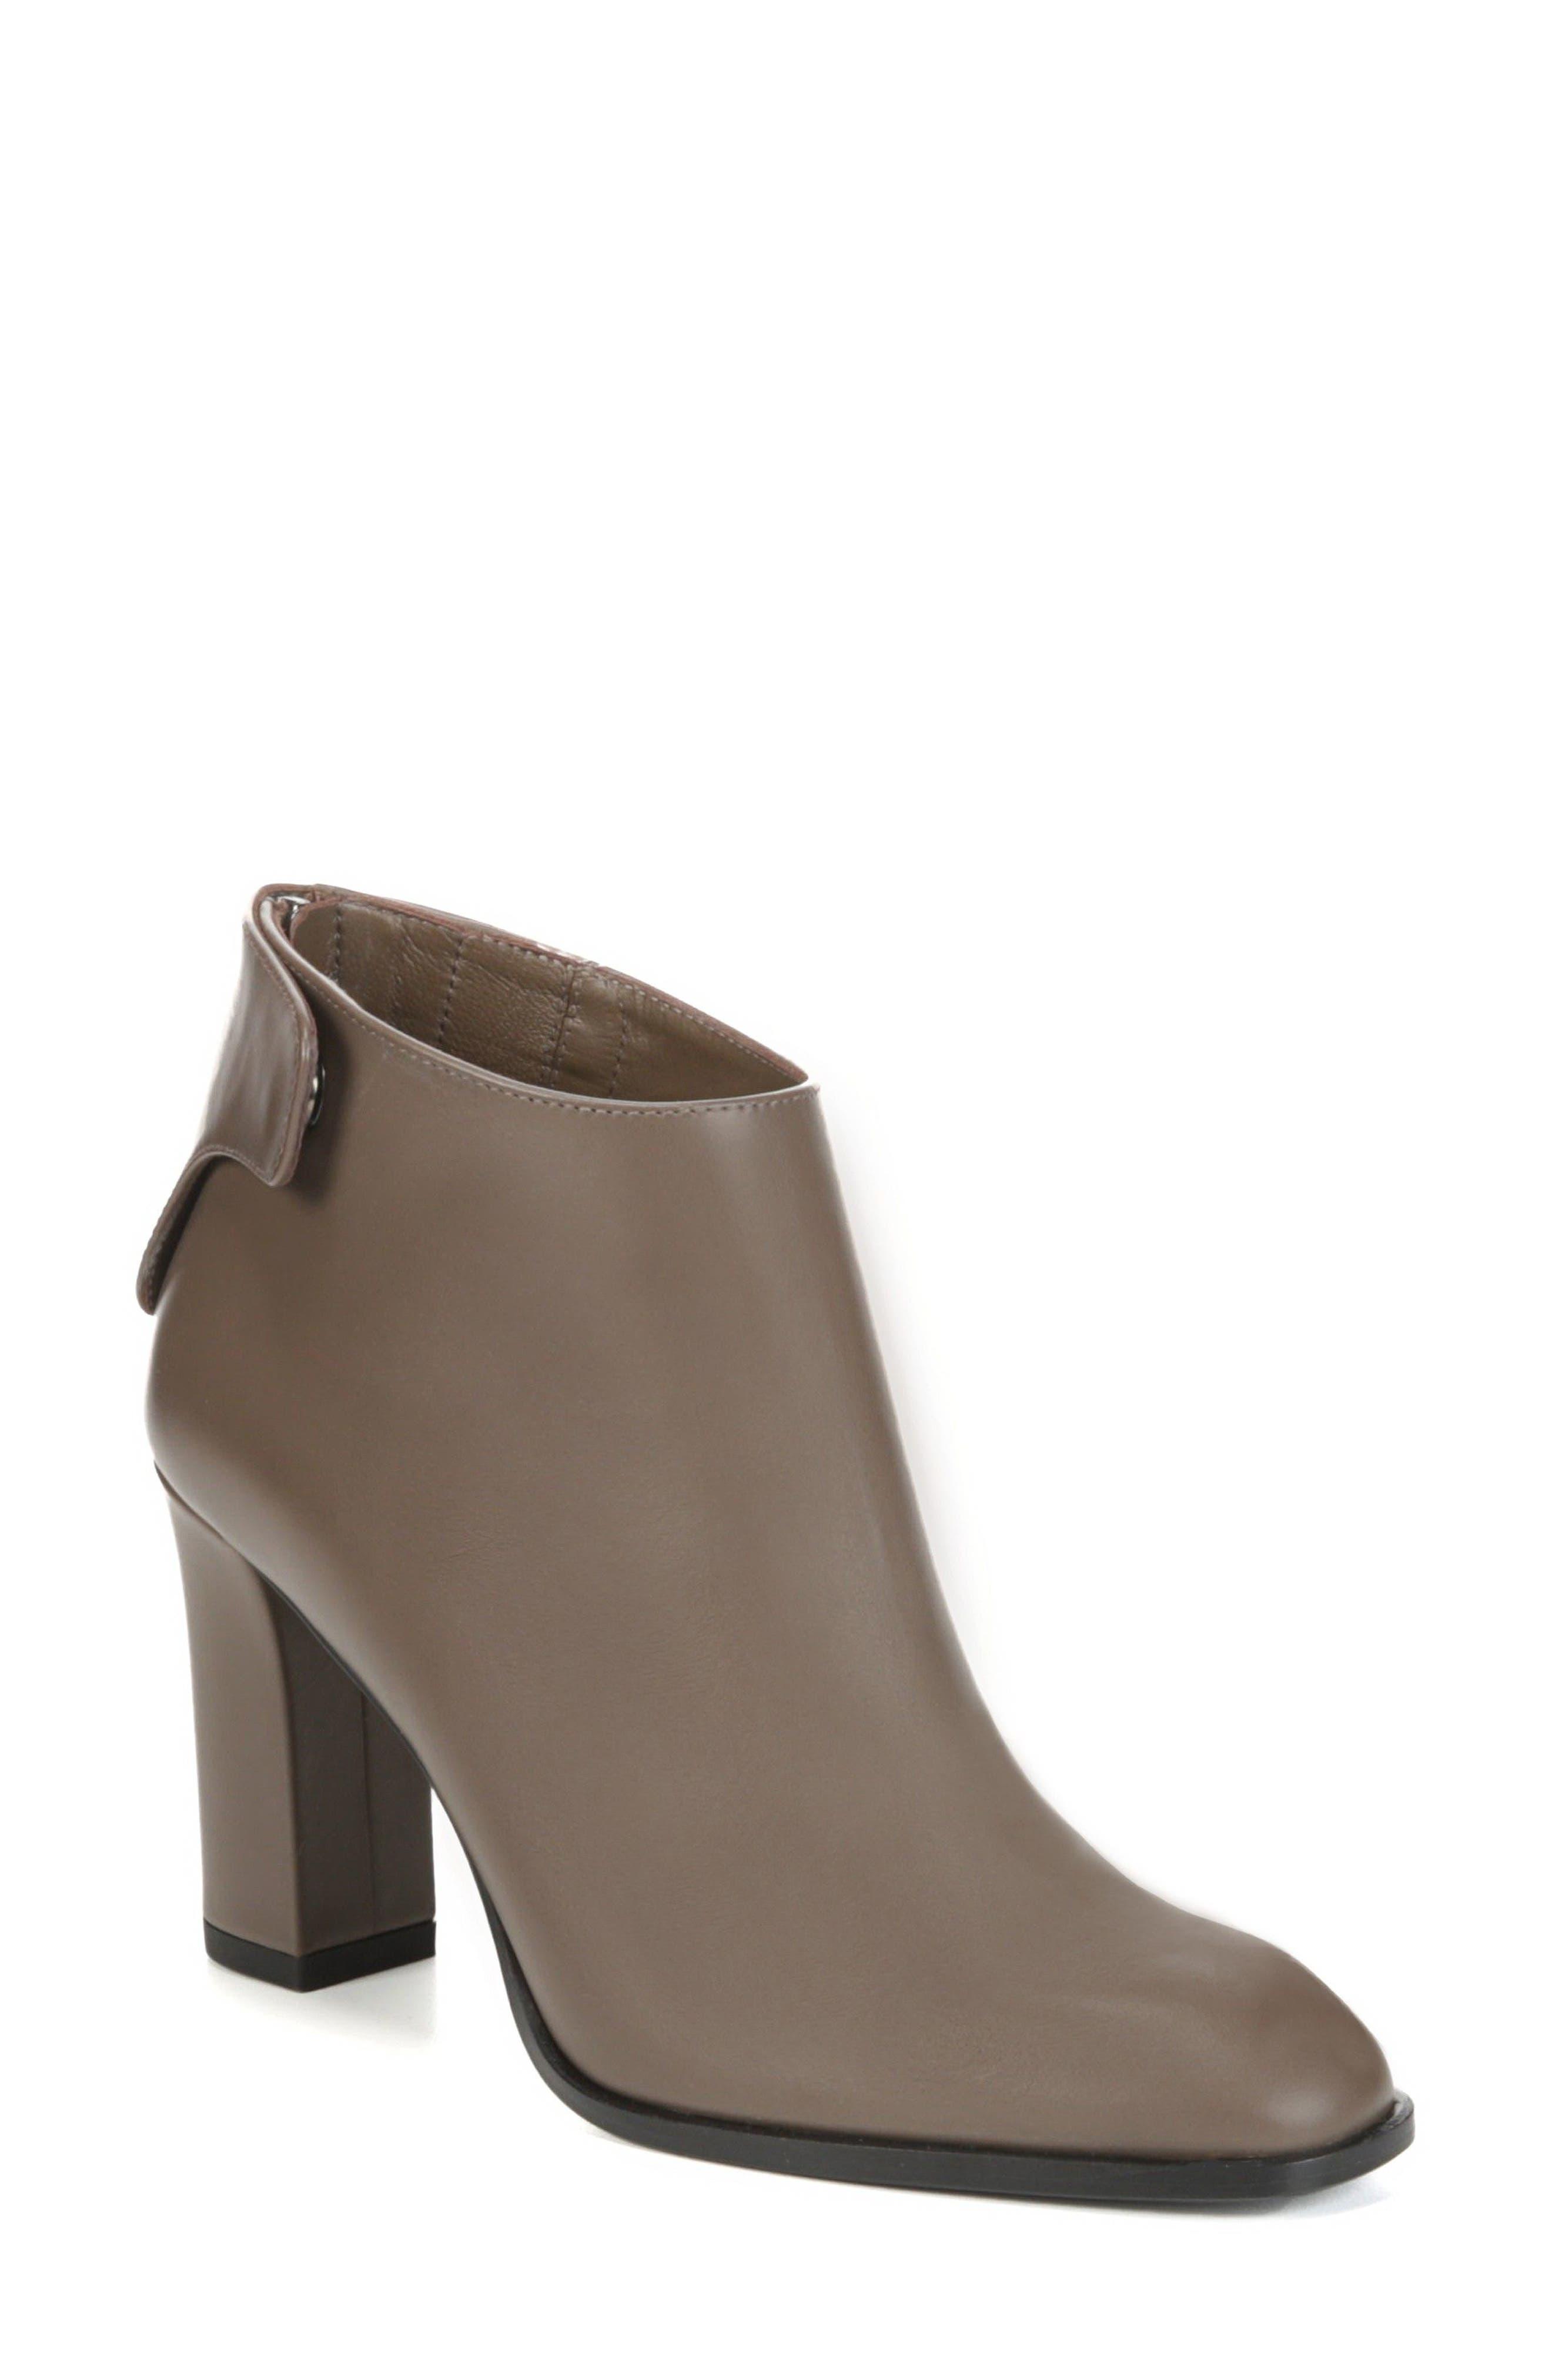 Main Image - Via Spiga Aston Ankle Boot (Women)